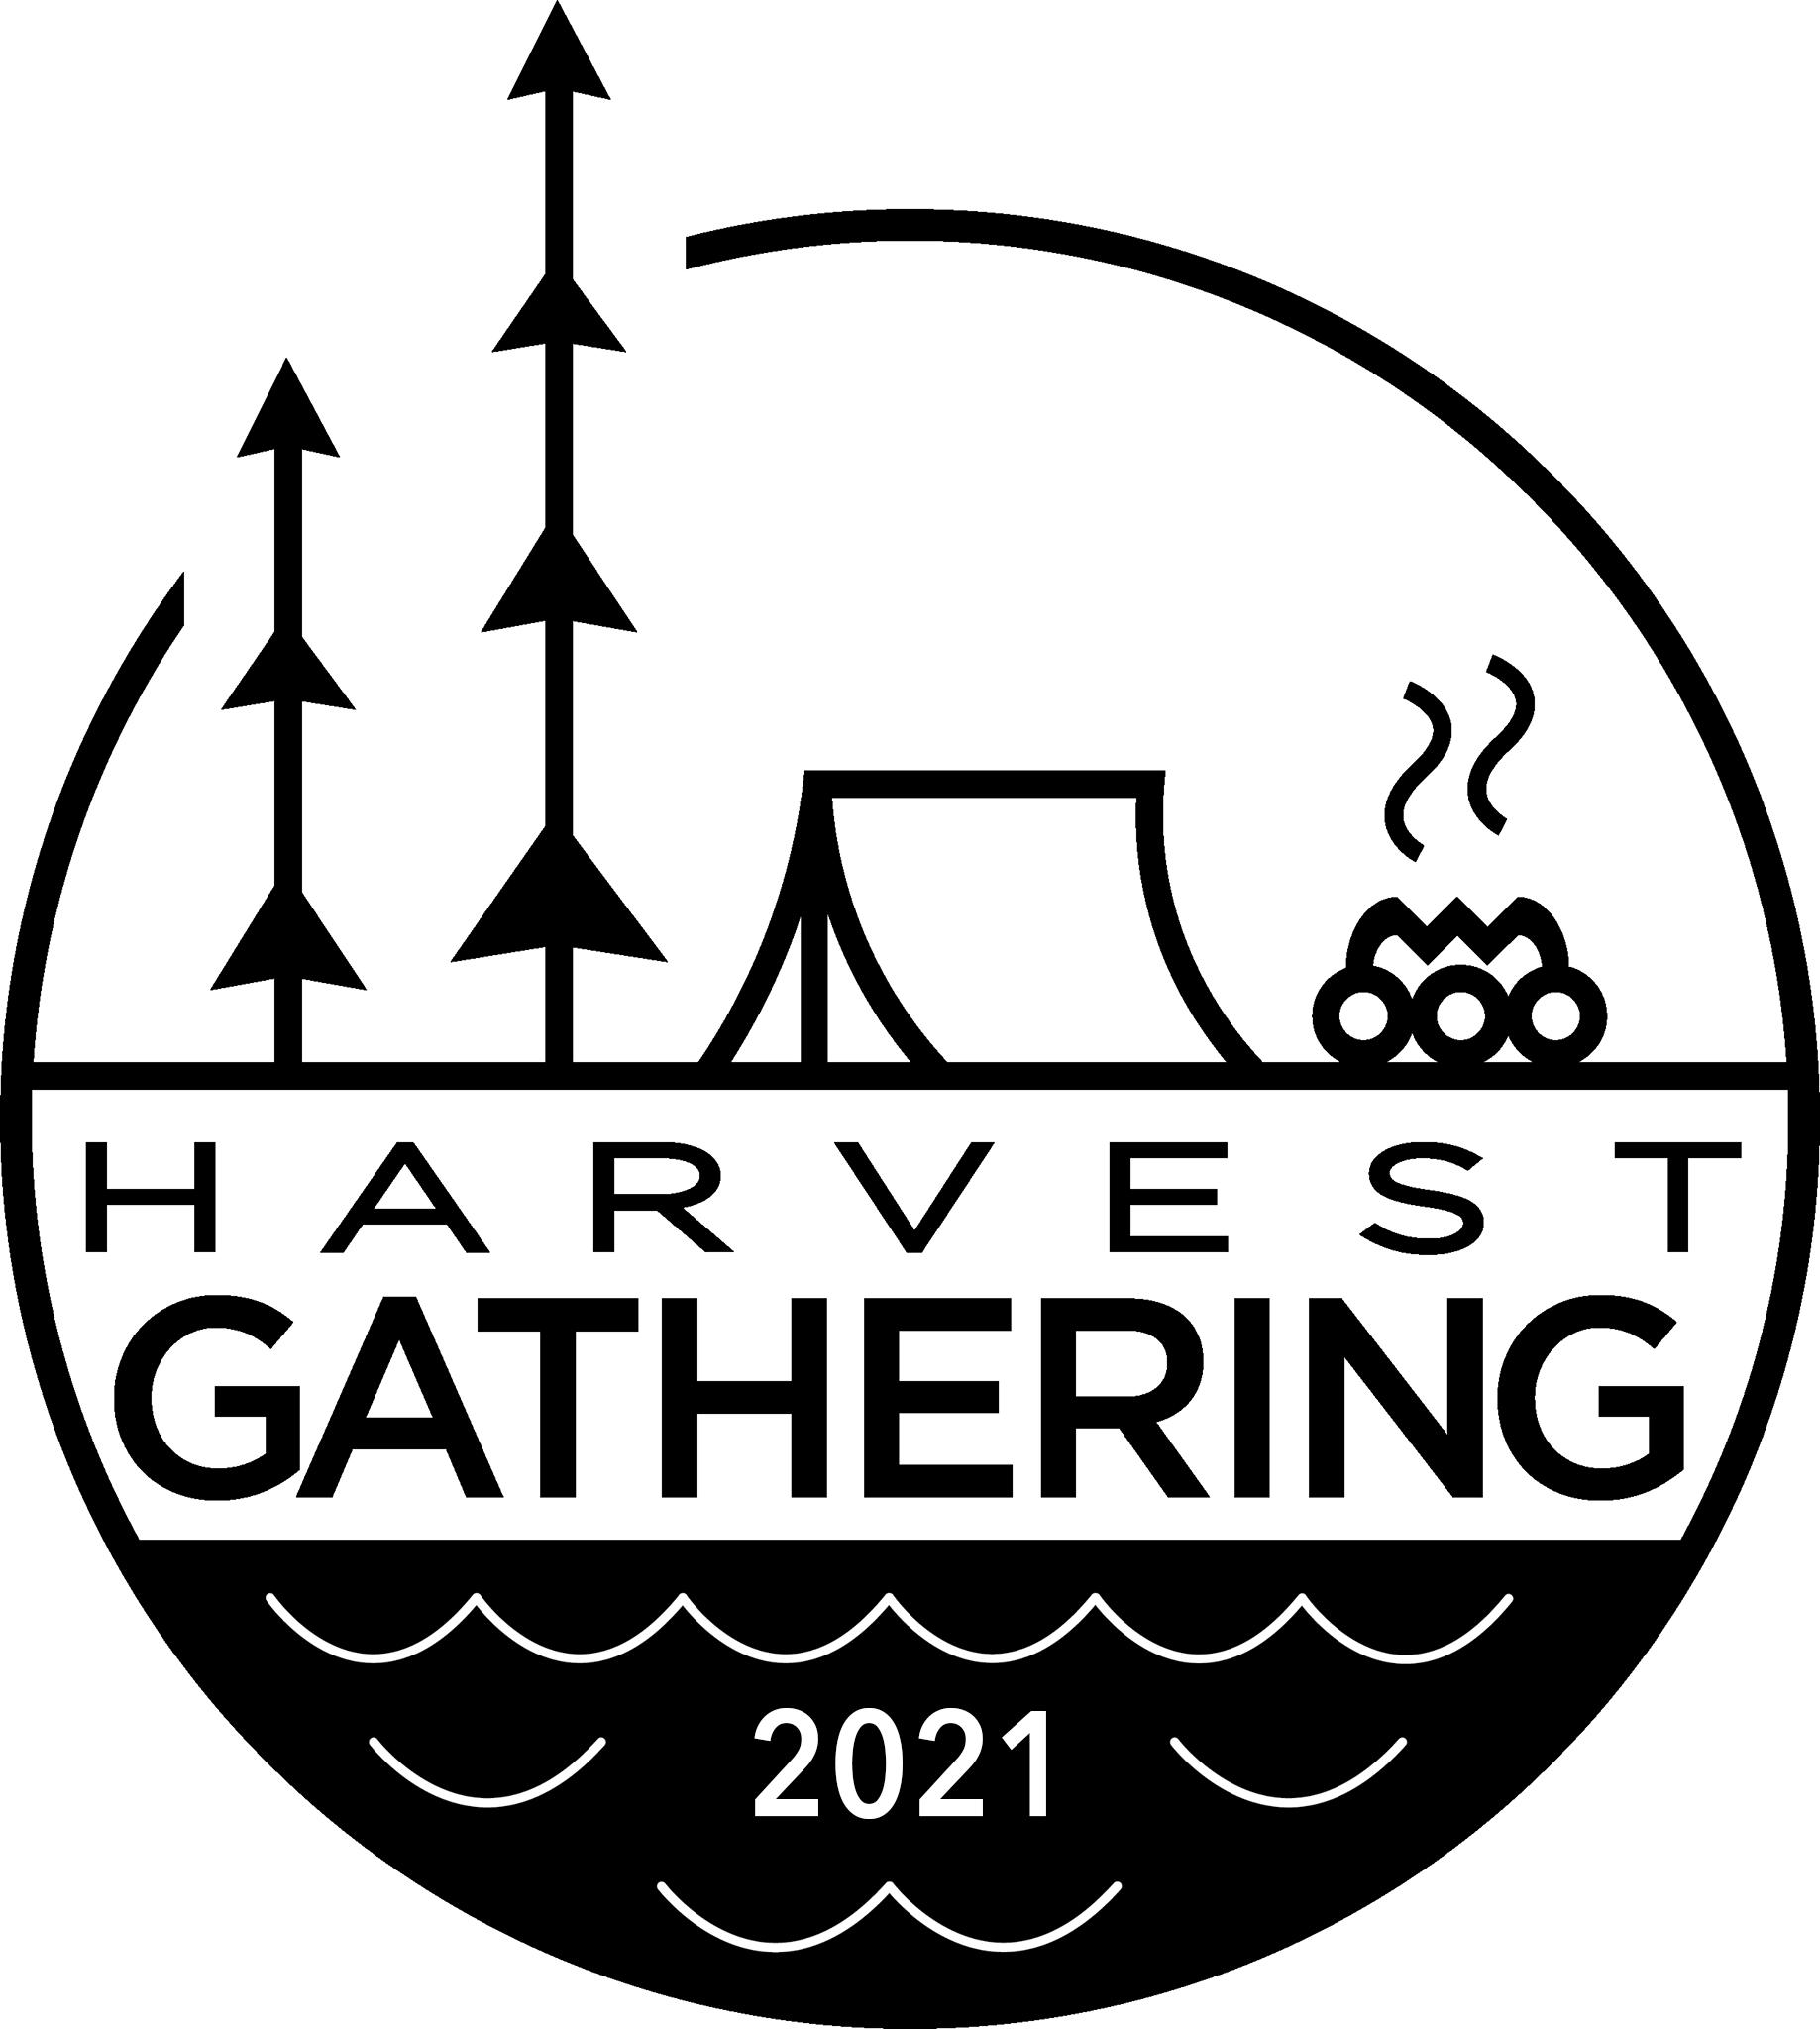 Harvest Gathering 2021